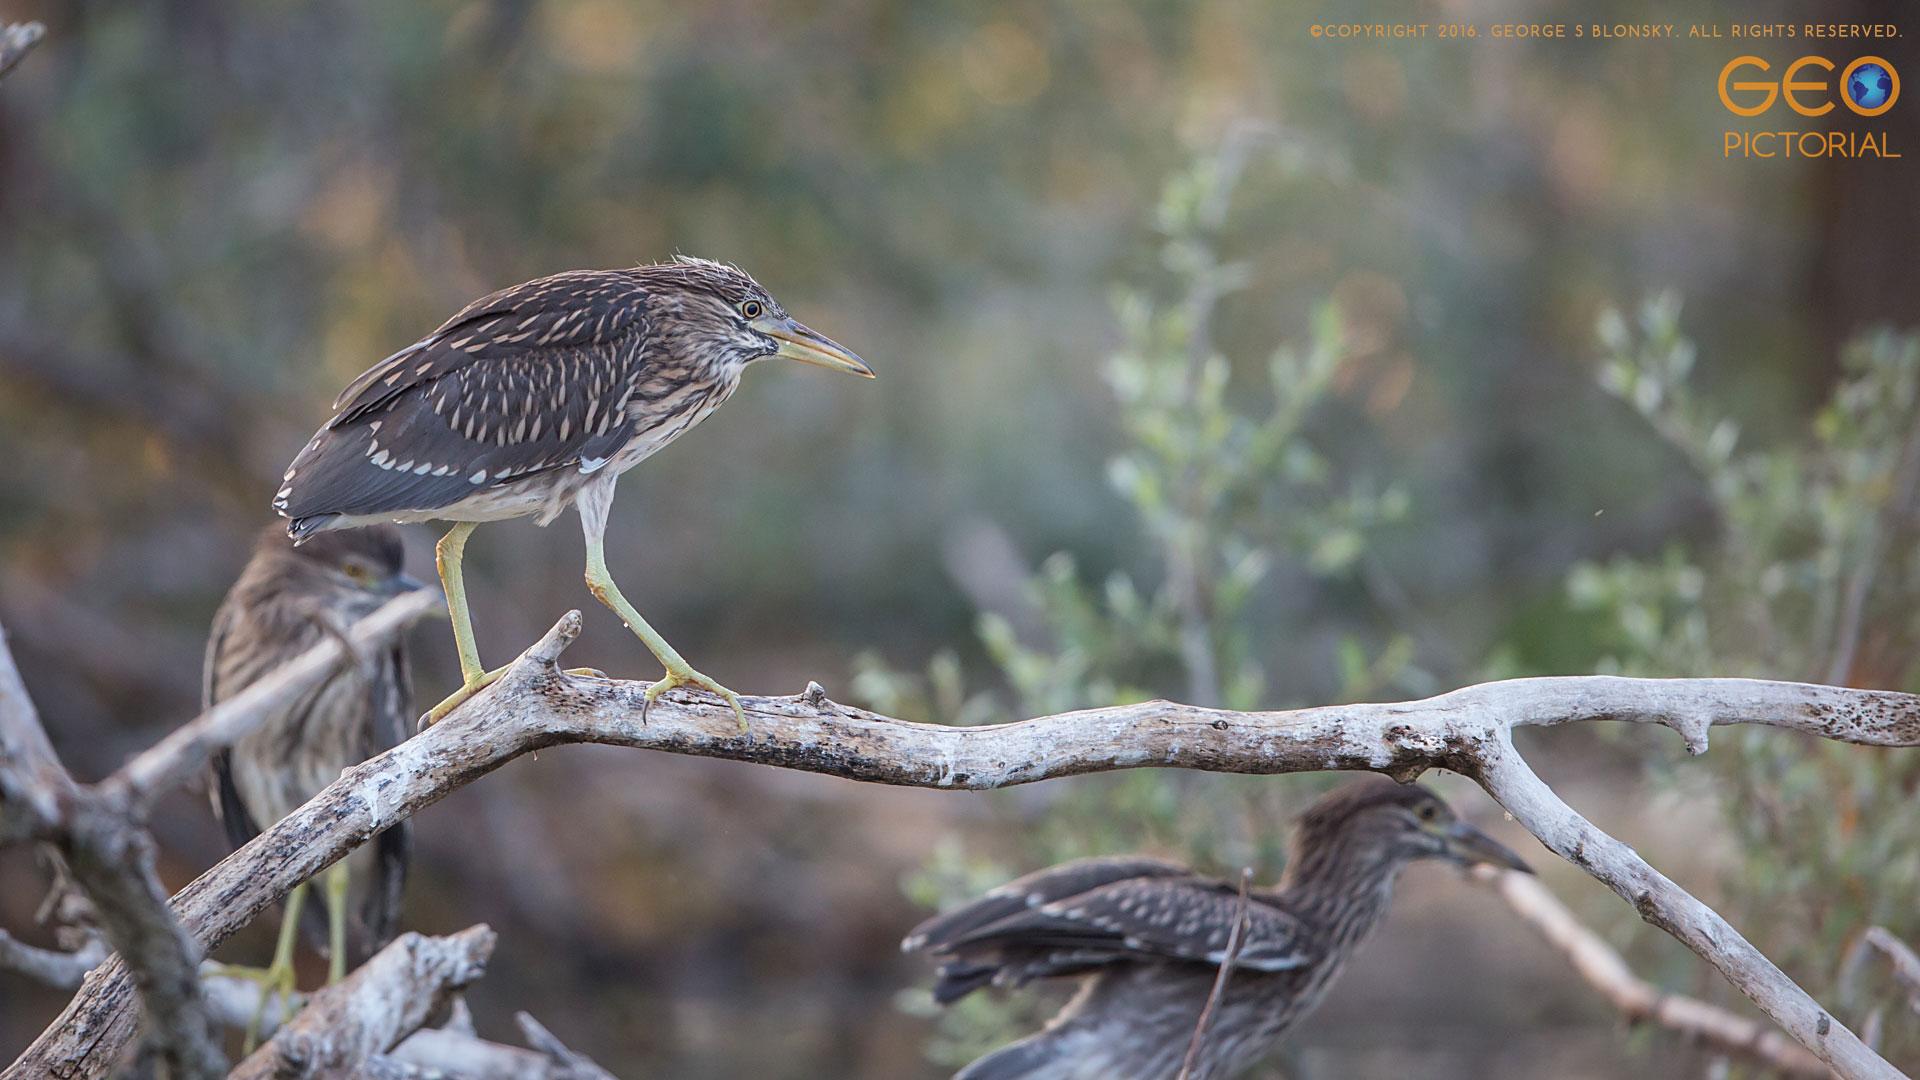 Juvenile Black-capped Night Heron